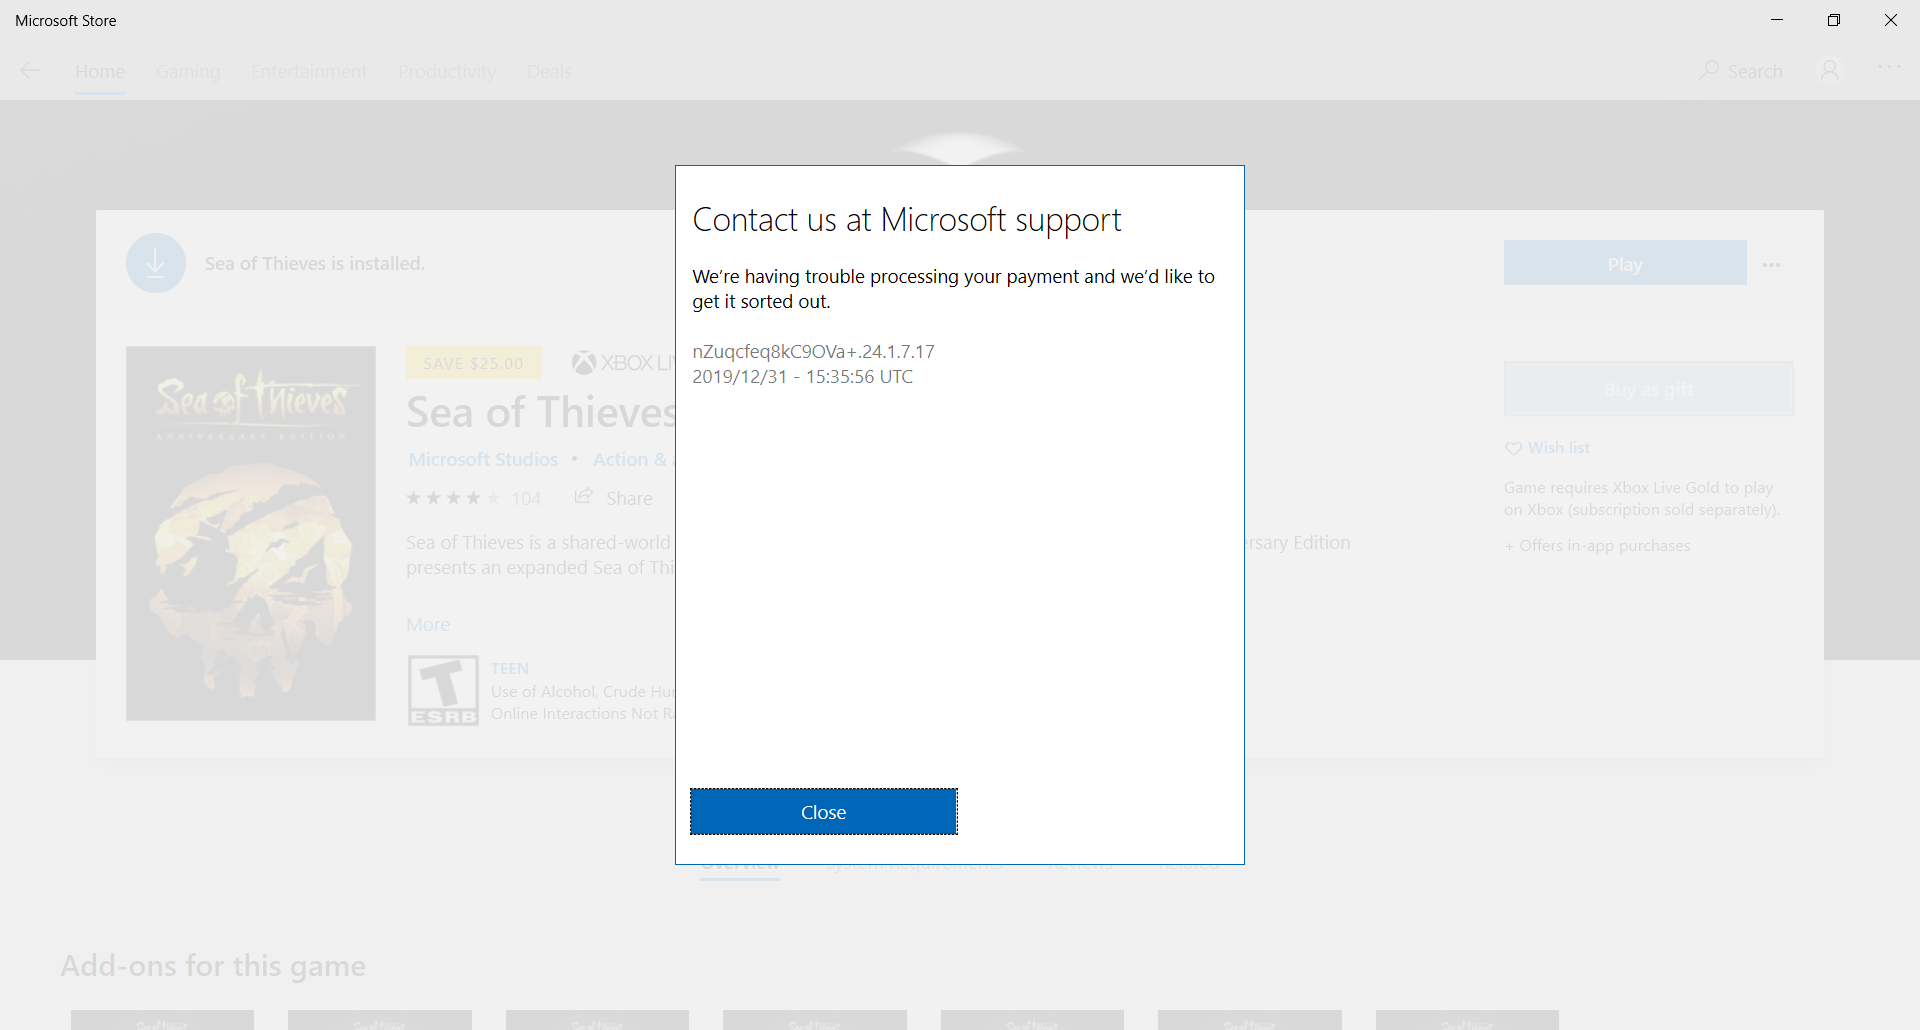 Microsoft gifting error f2d31e49-6037-4571-b5c5-3dddfc5852c9?upload=true.png